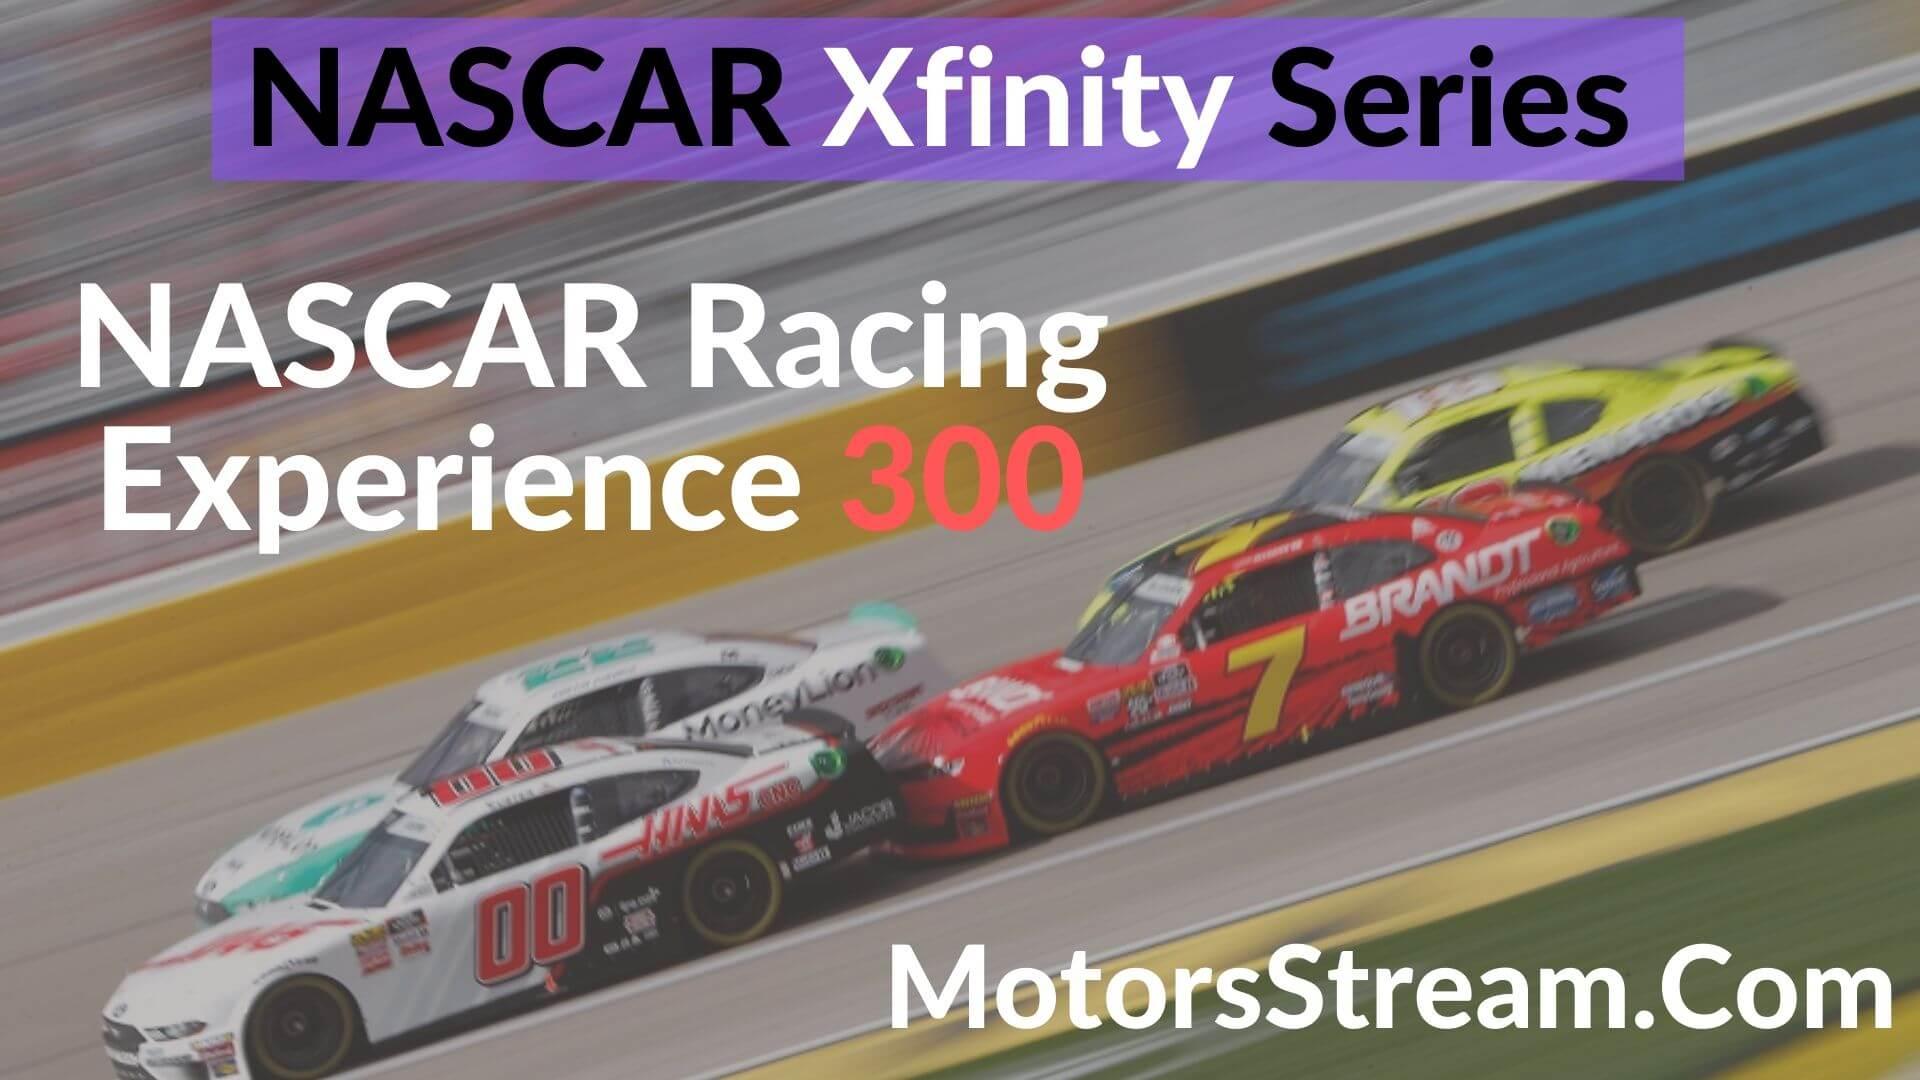 NASCAR Racing Experience 300 Live Stream    XFINITY SERIES 2020